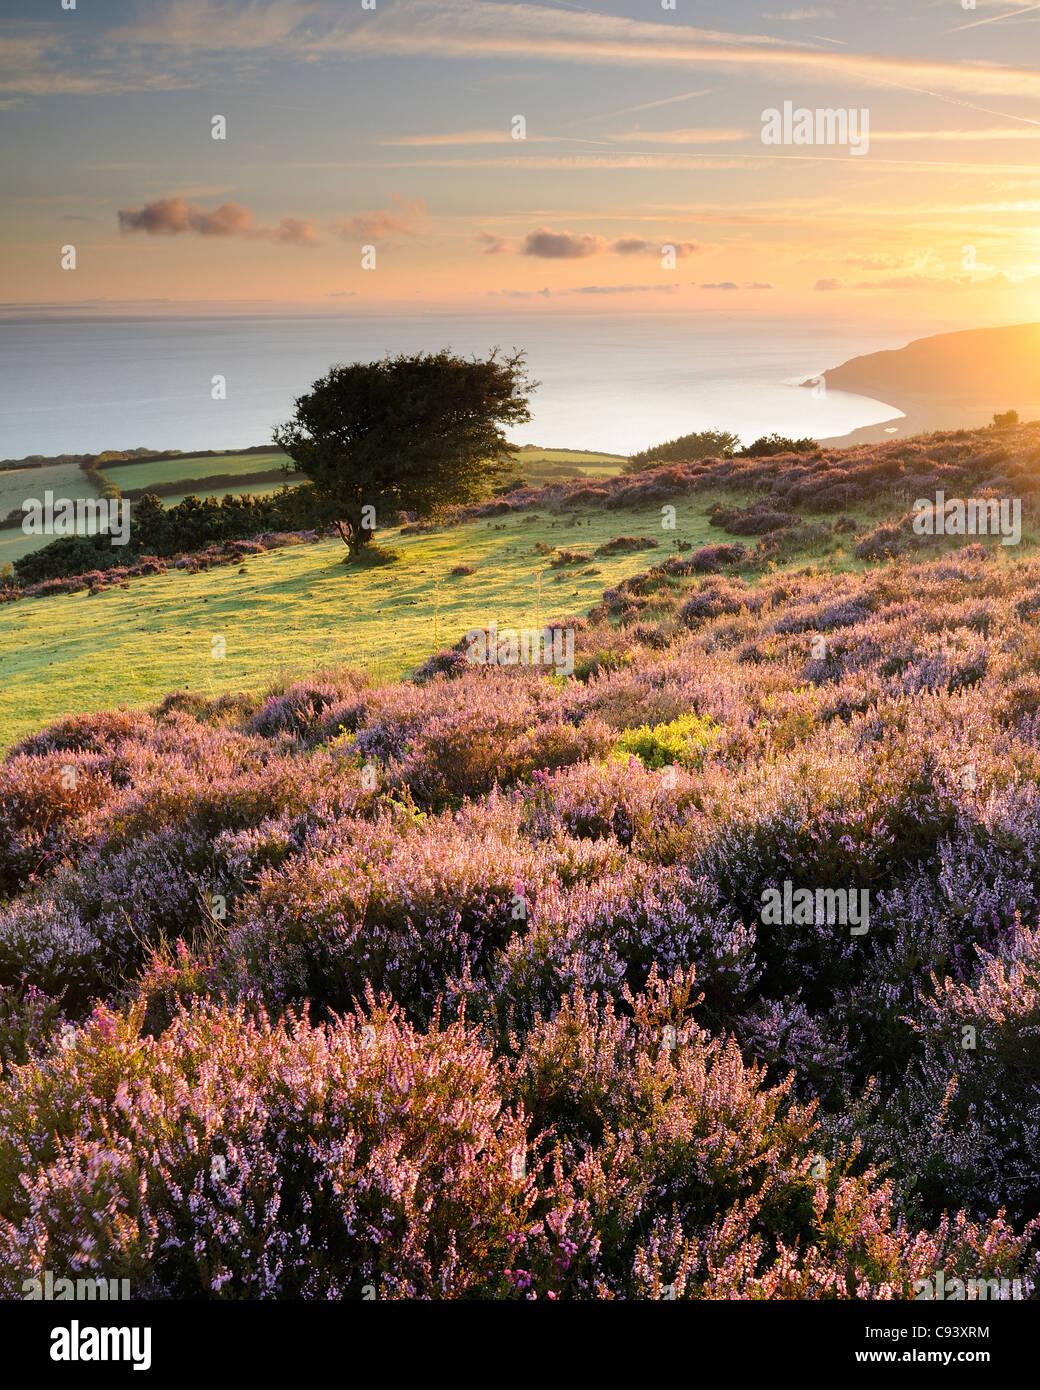 Flowering heather and a hawthorn tree on Porlock Common at sunrise. Exmoor, UK. - Stock Image